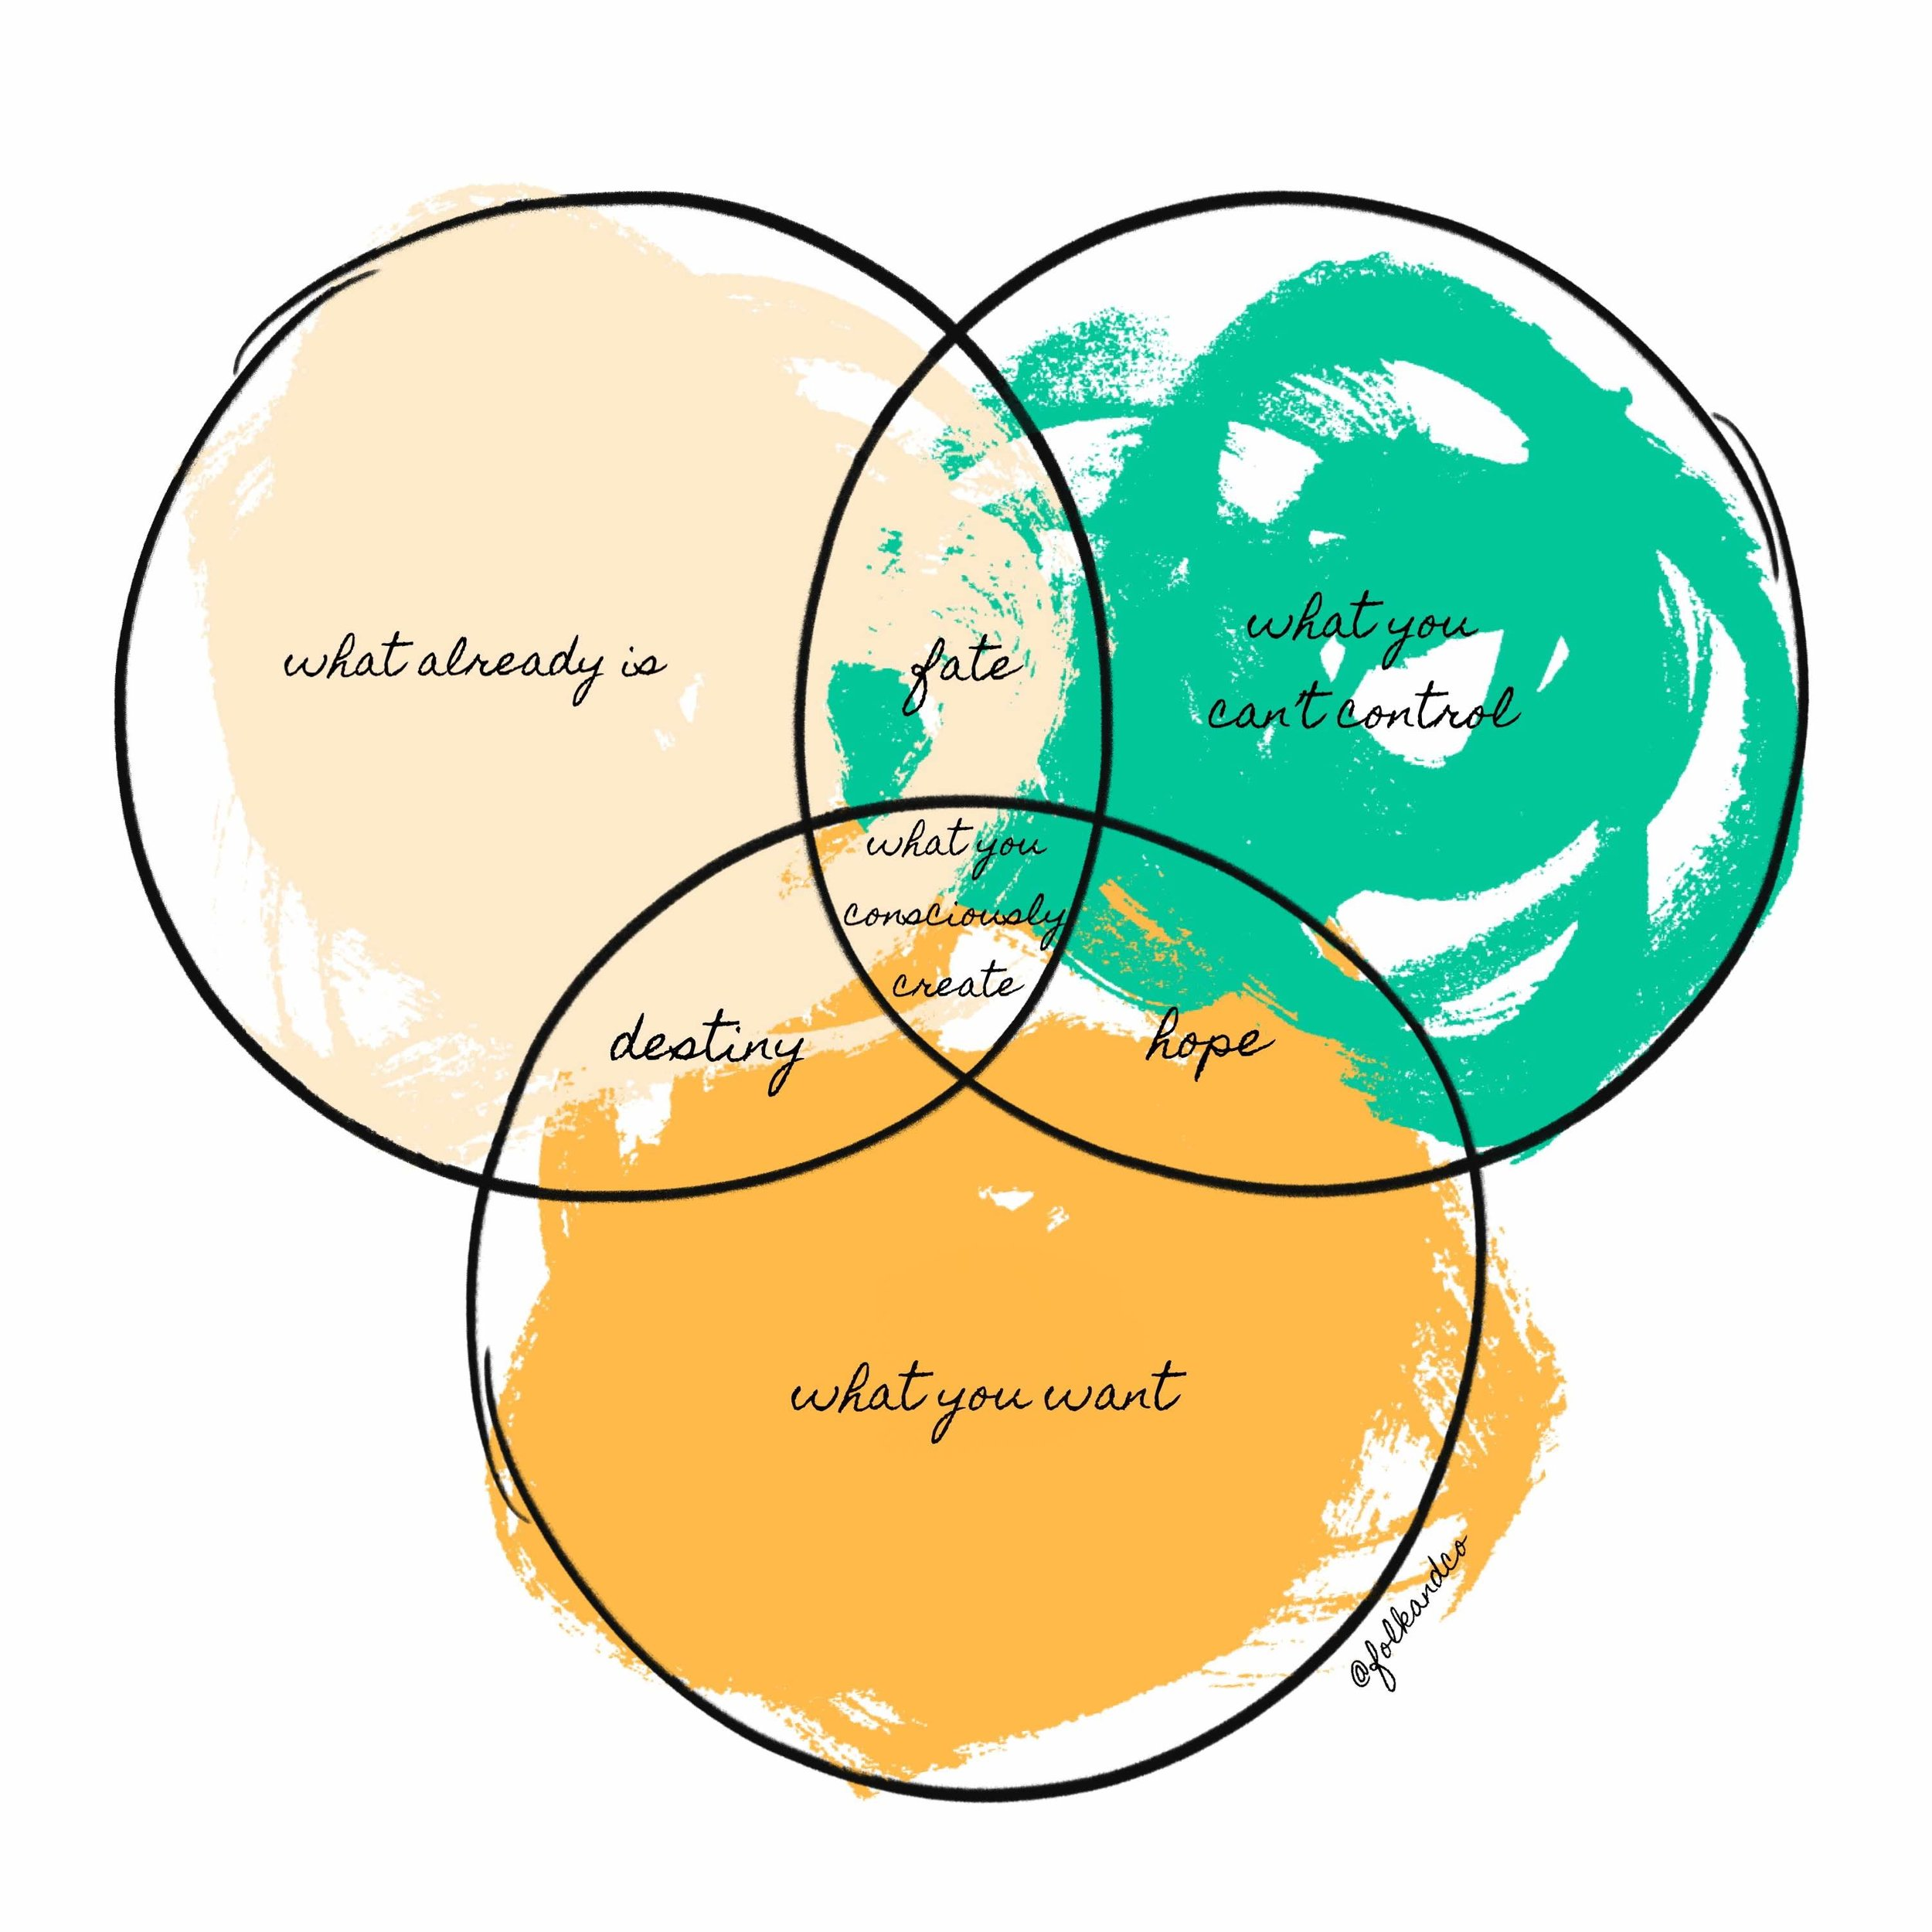 law of attraction life venn diagram.jpg